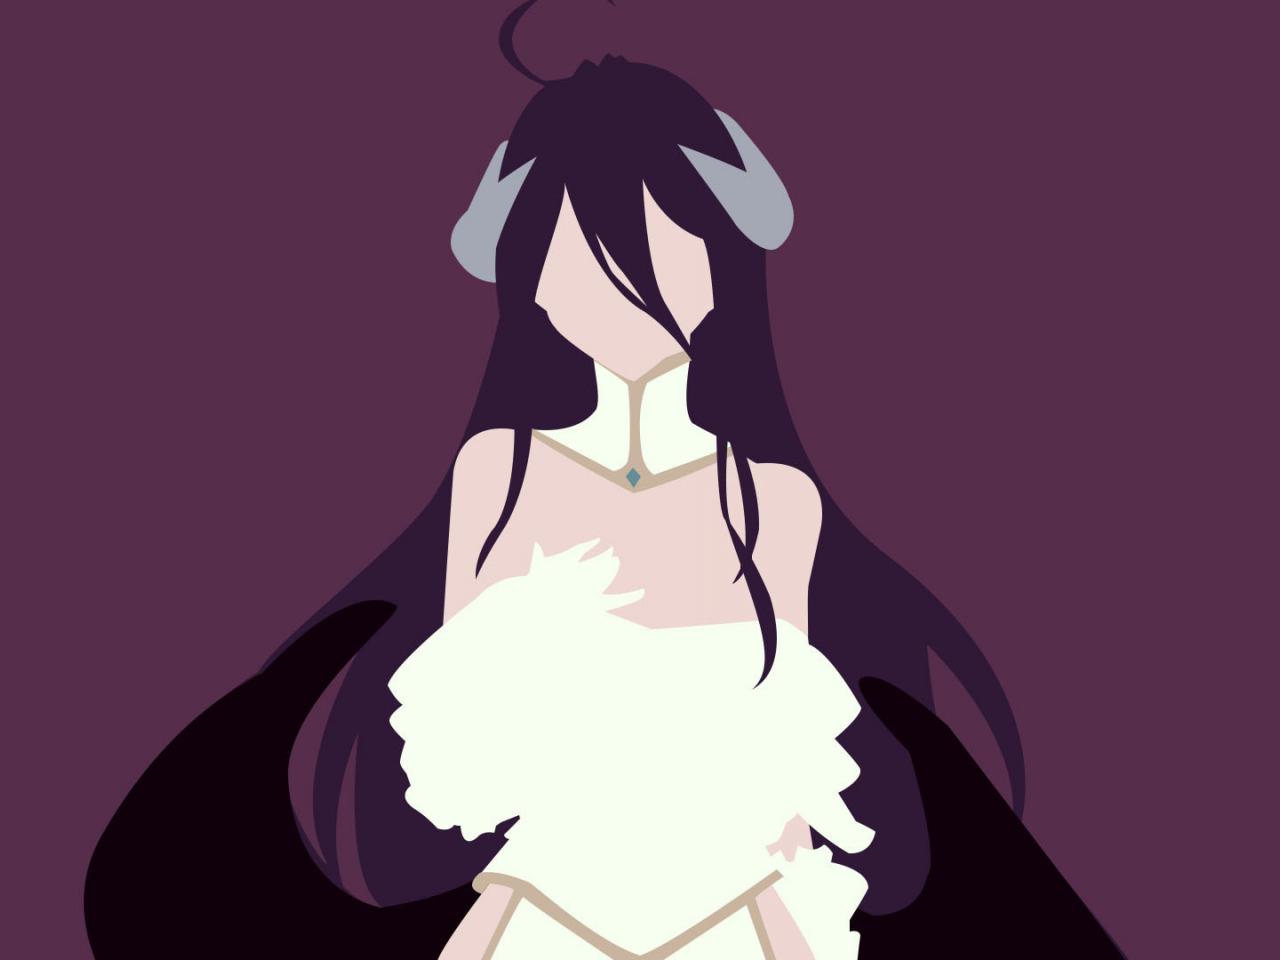 Download 1280x960 Wallpaper Minimal Albedo Overlord Anime